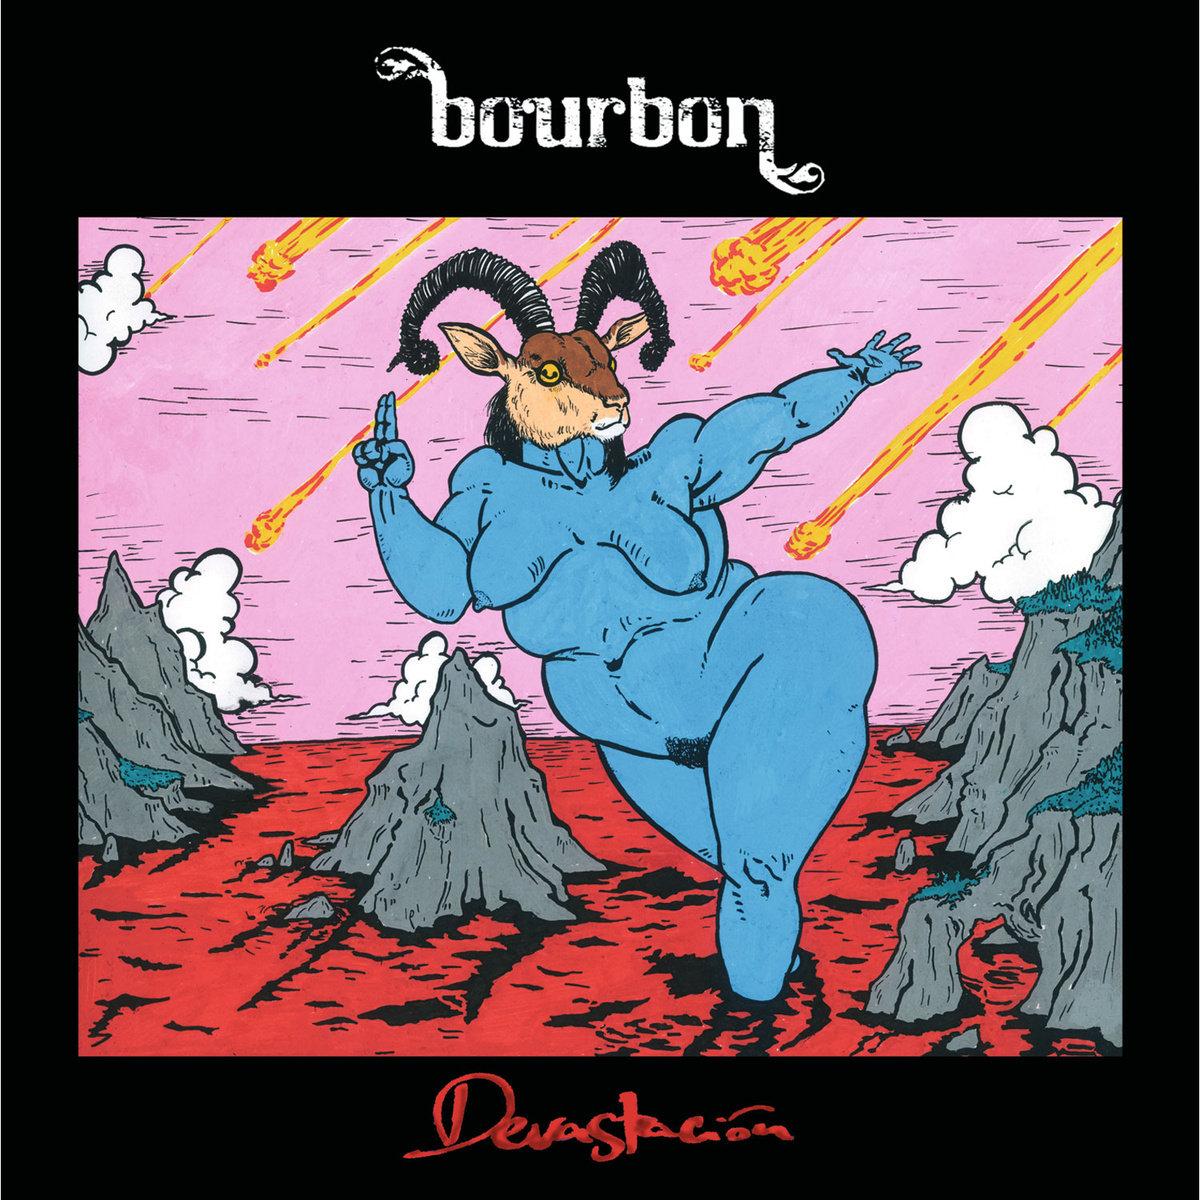 https://bourbon1.bandcamp.com/album/devastaci-n-2